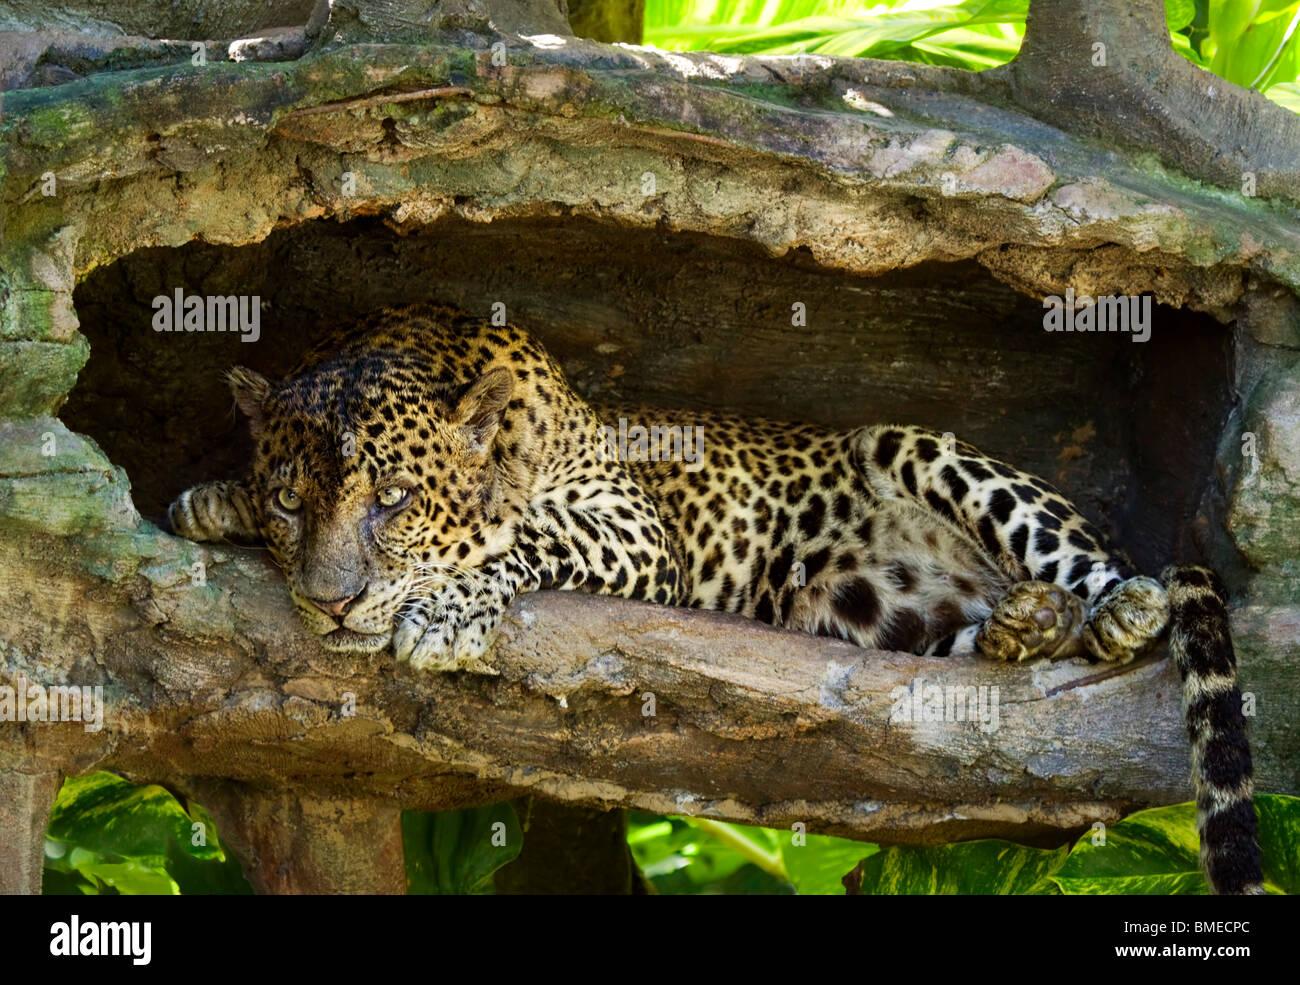 Leopard; Panthera pardus - Stock Image